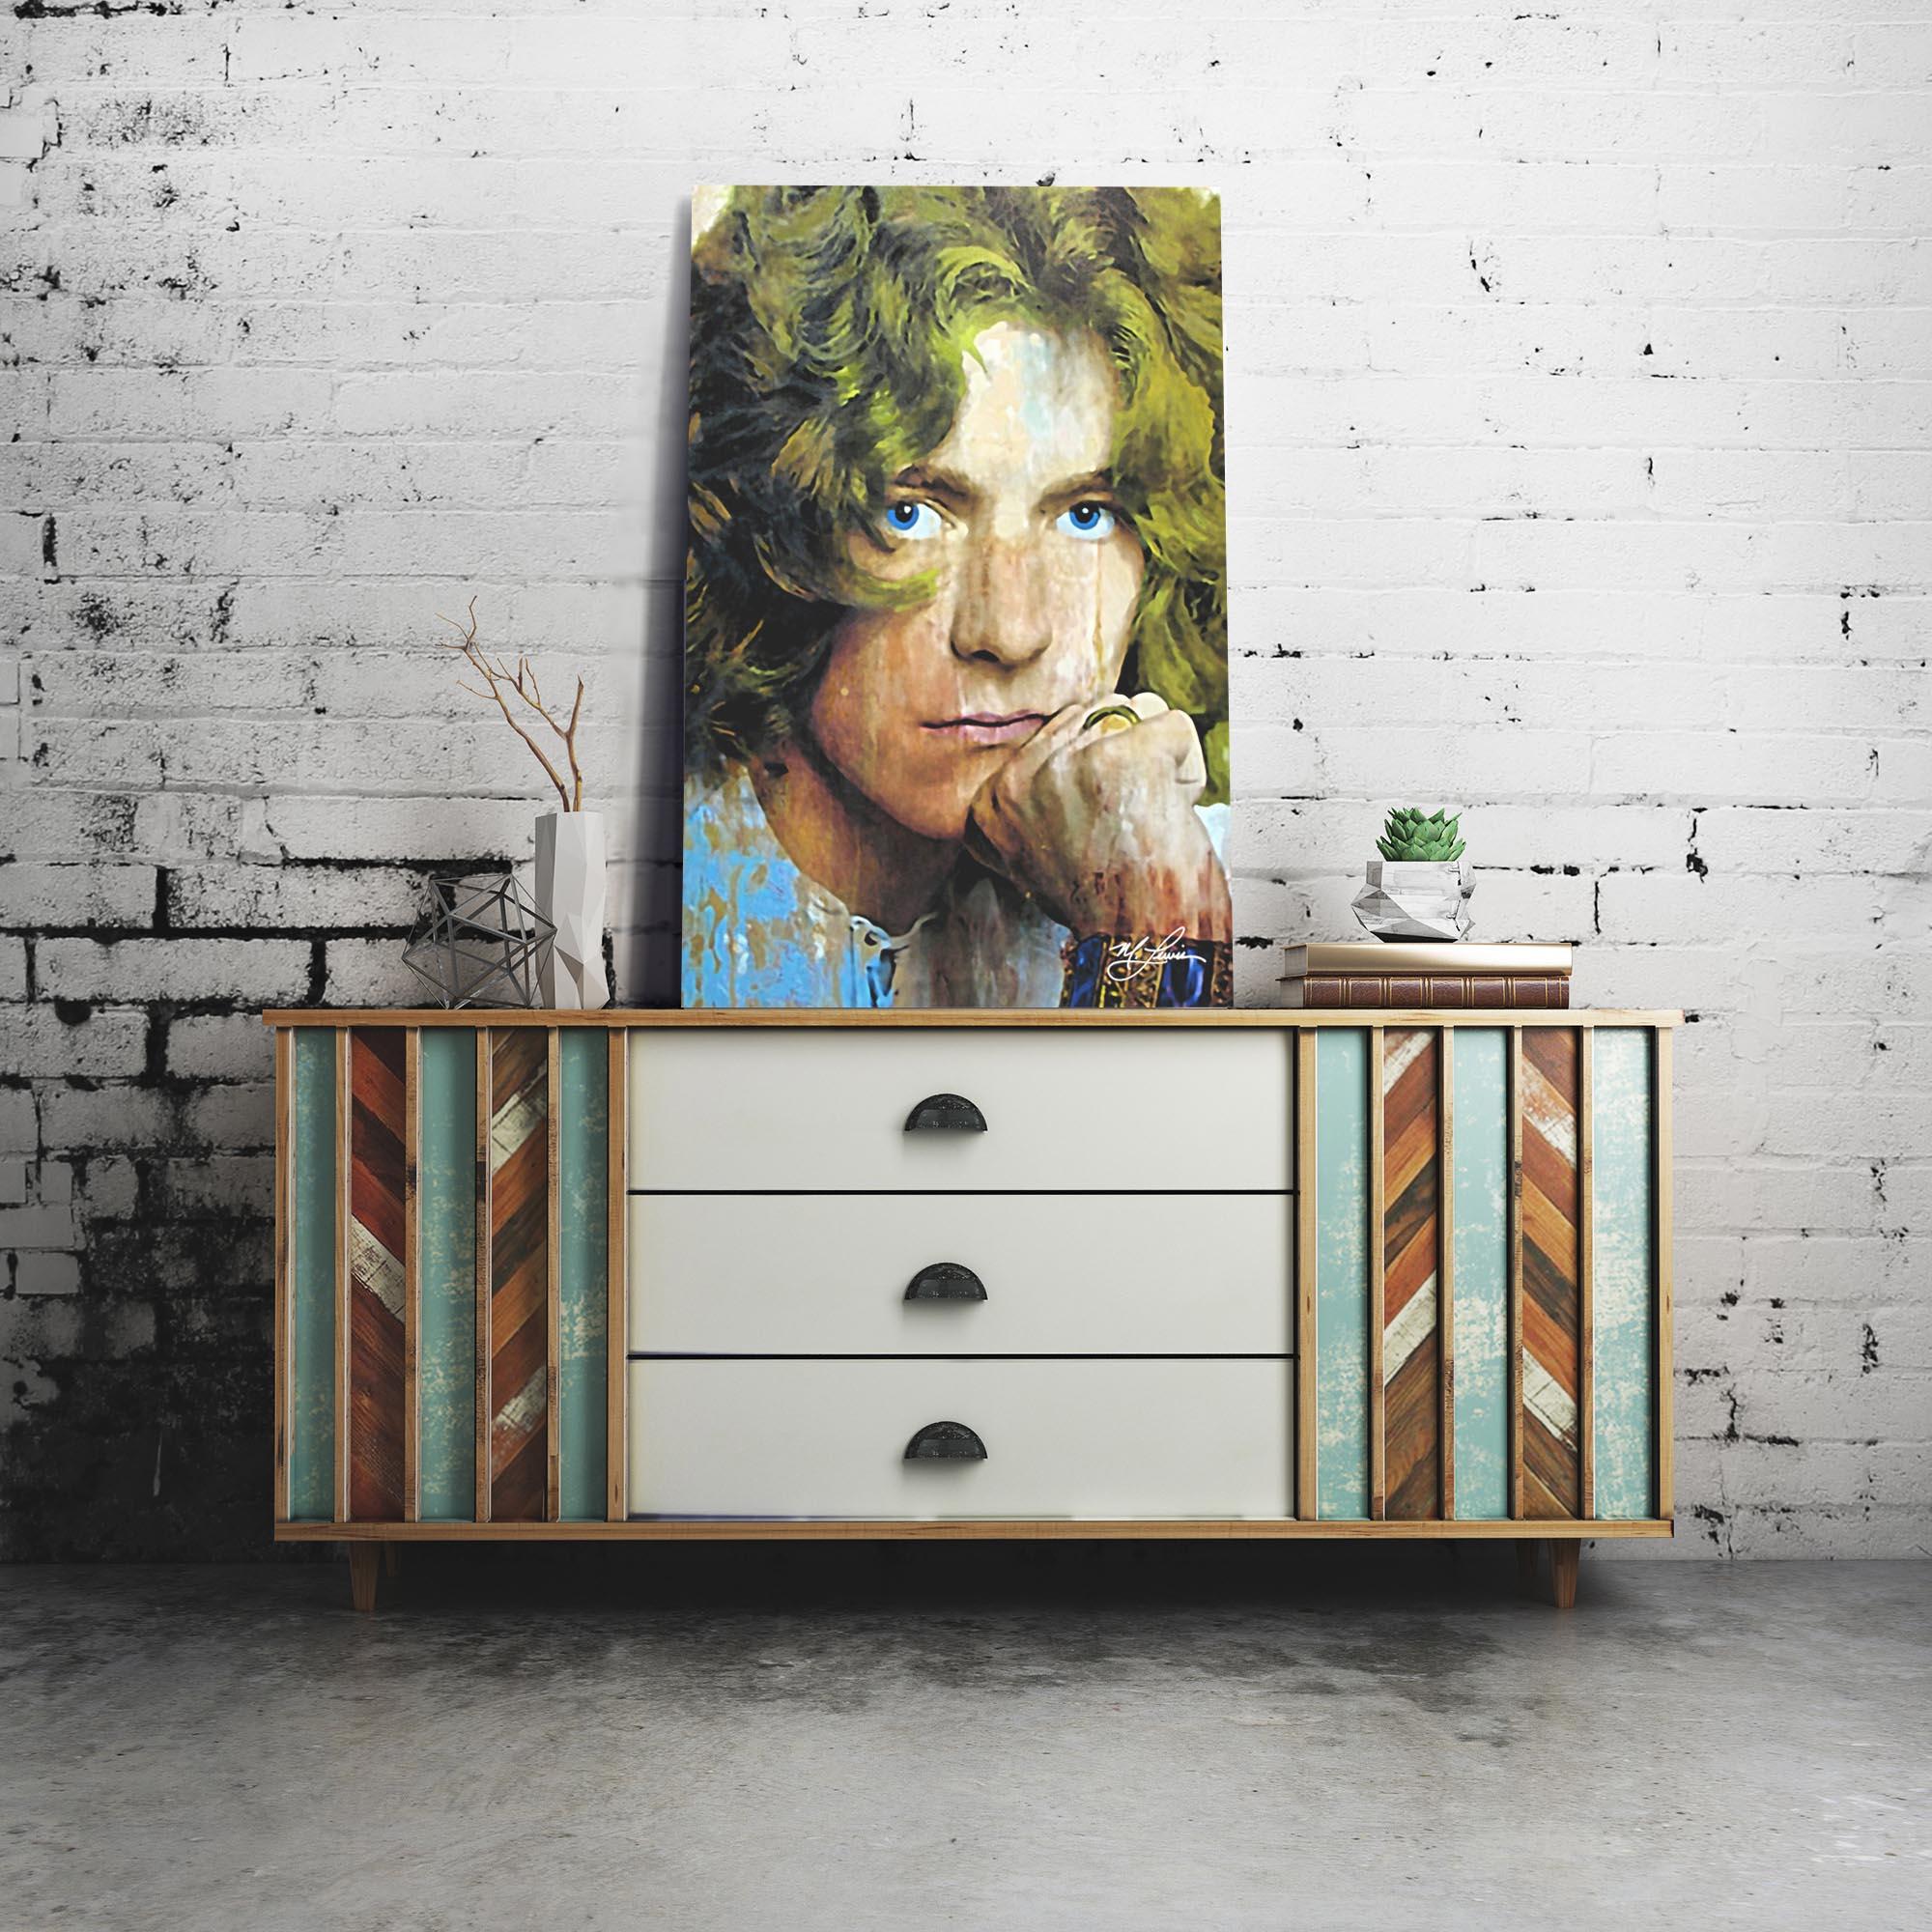 Robert Plant Shear Power by Mark Lewis - Celebrity Pop Art on Metal or Plexiglass - ML0044